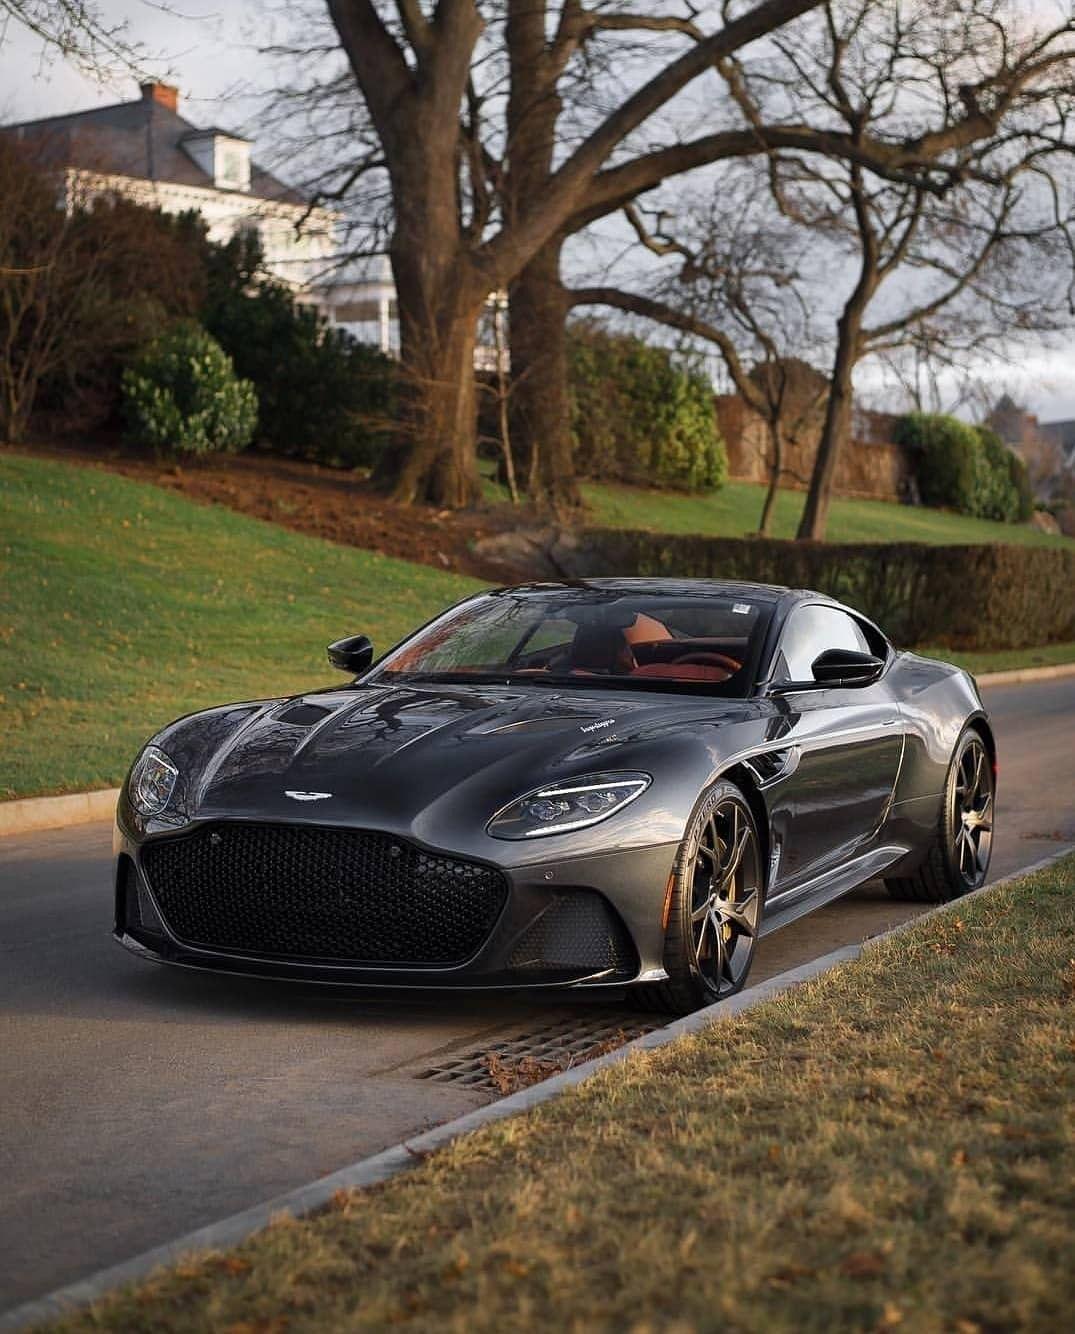 Z Style Aston Martin Dream Cars Luxury Cars